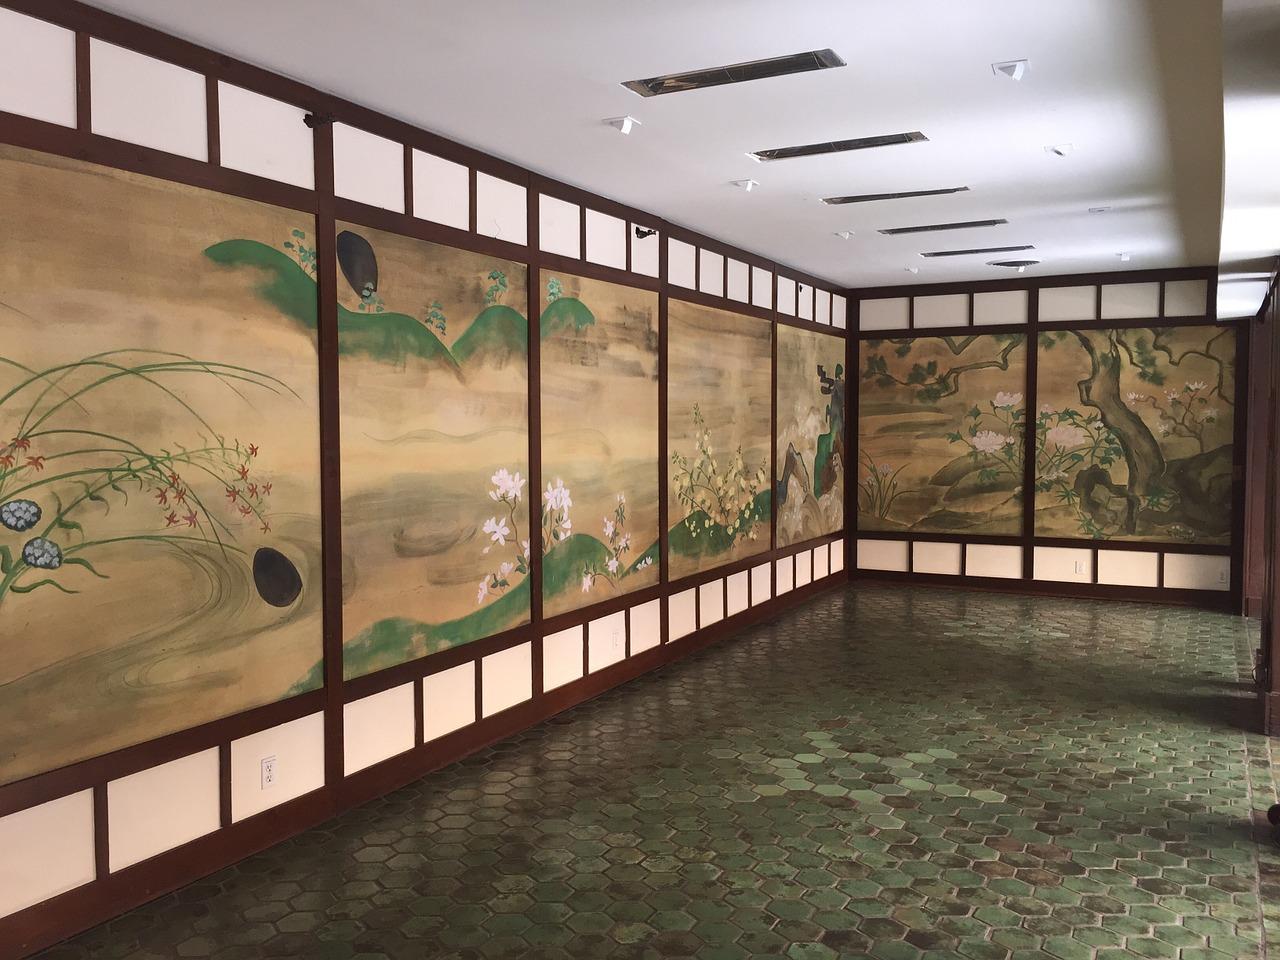 asian-wall-mural-670839_1280